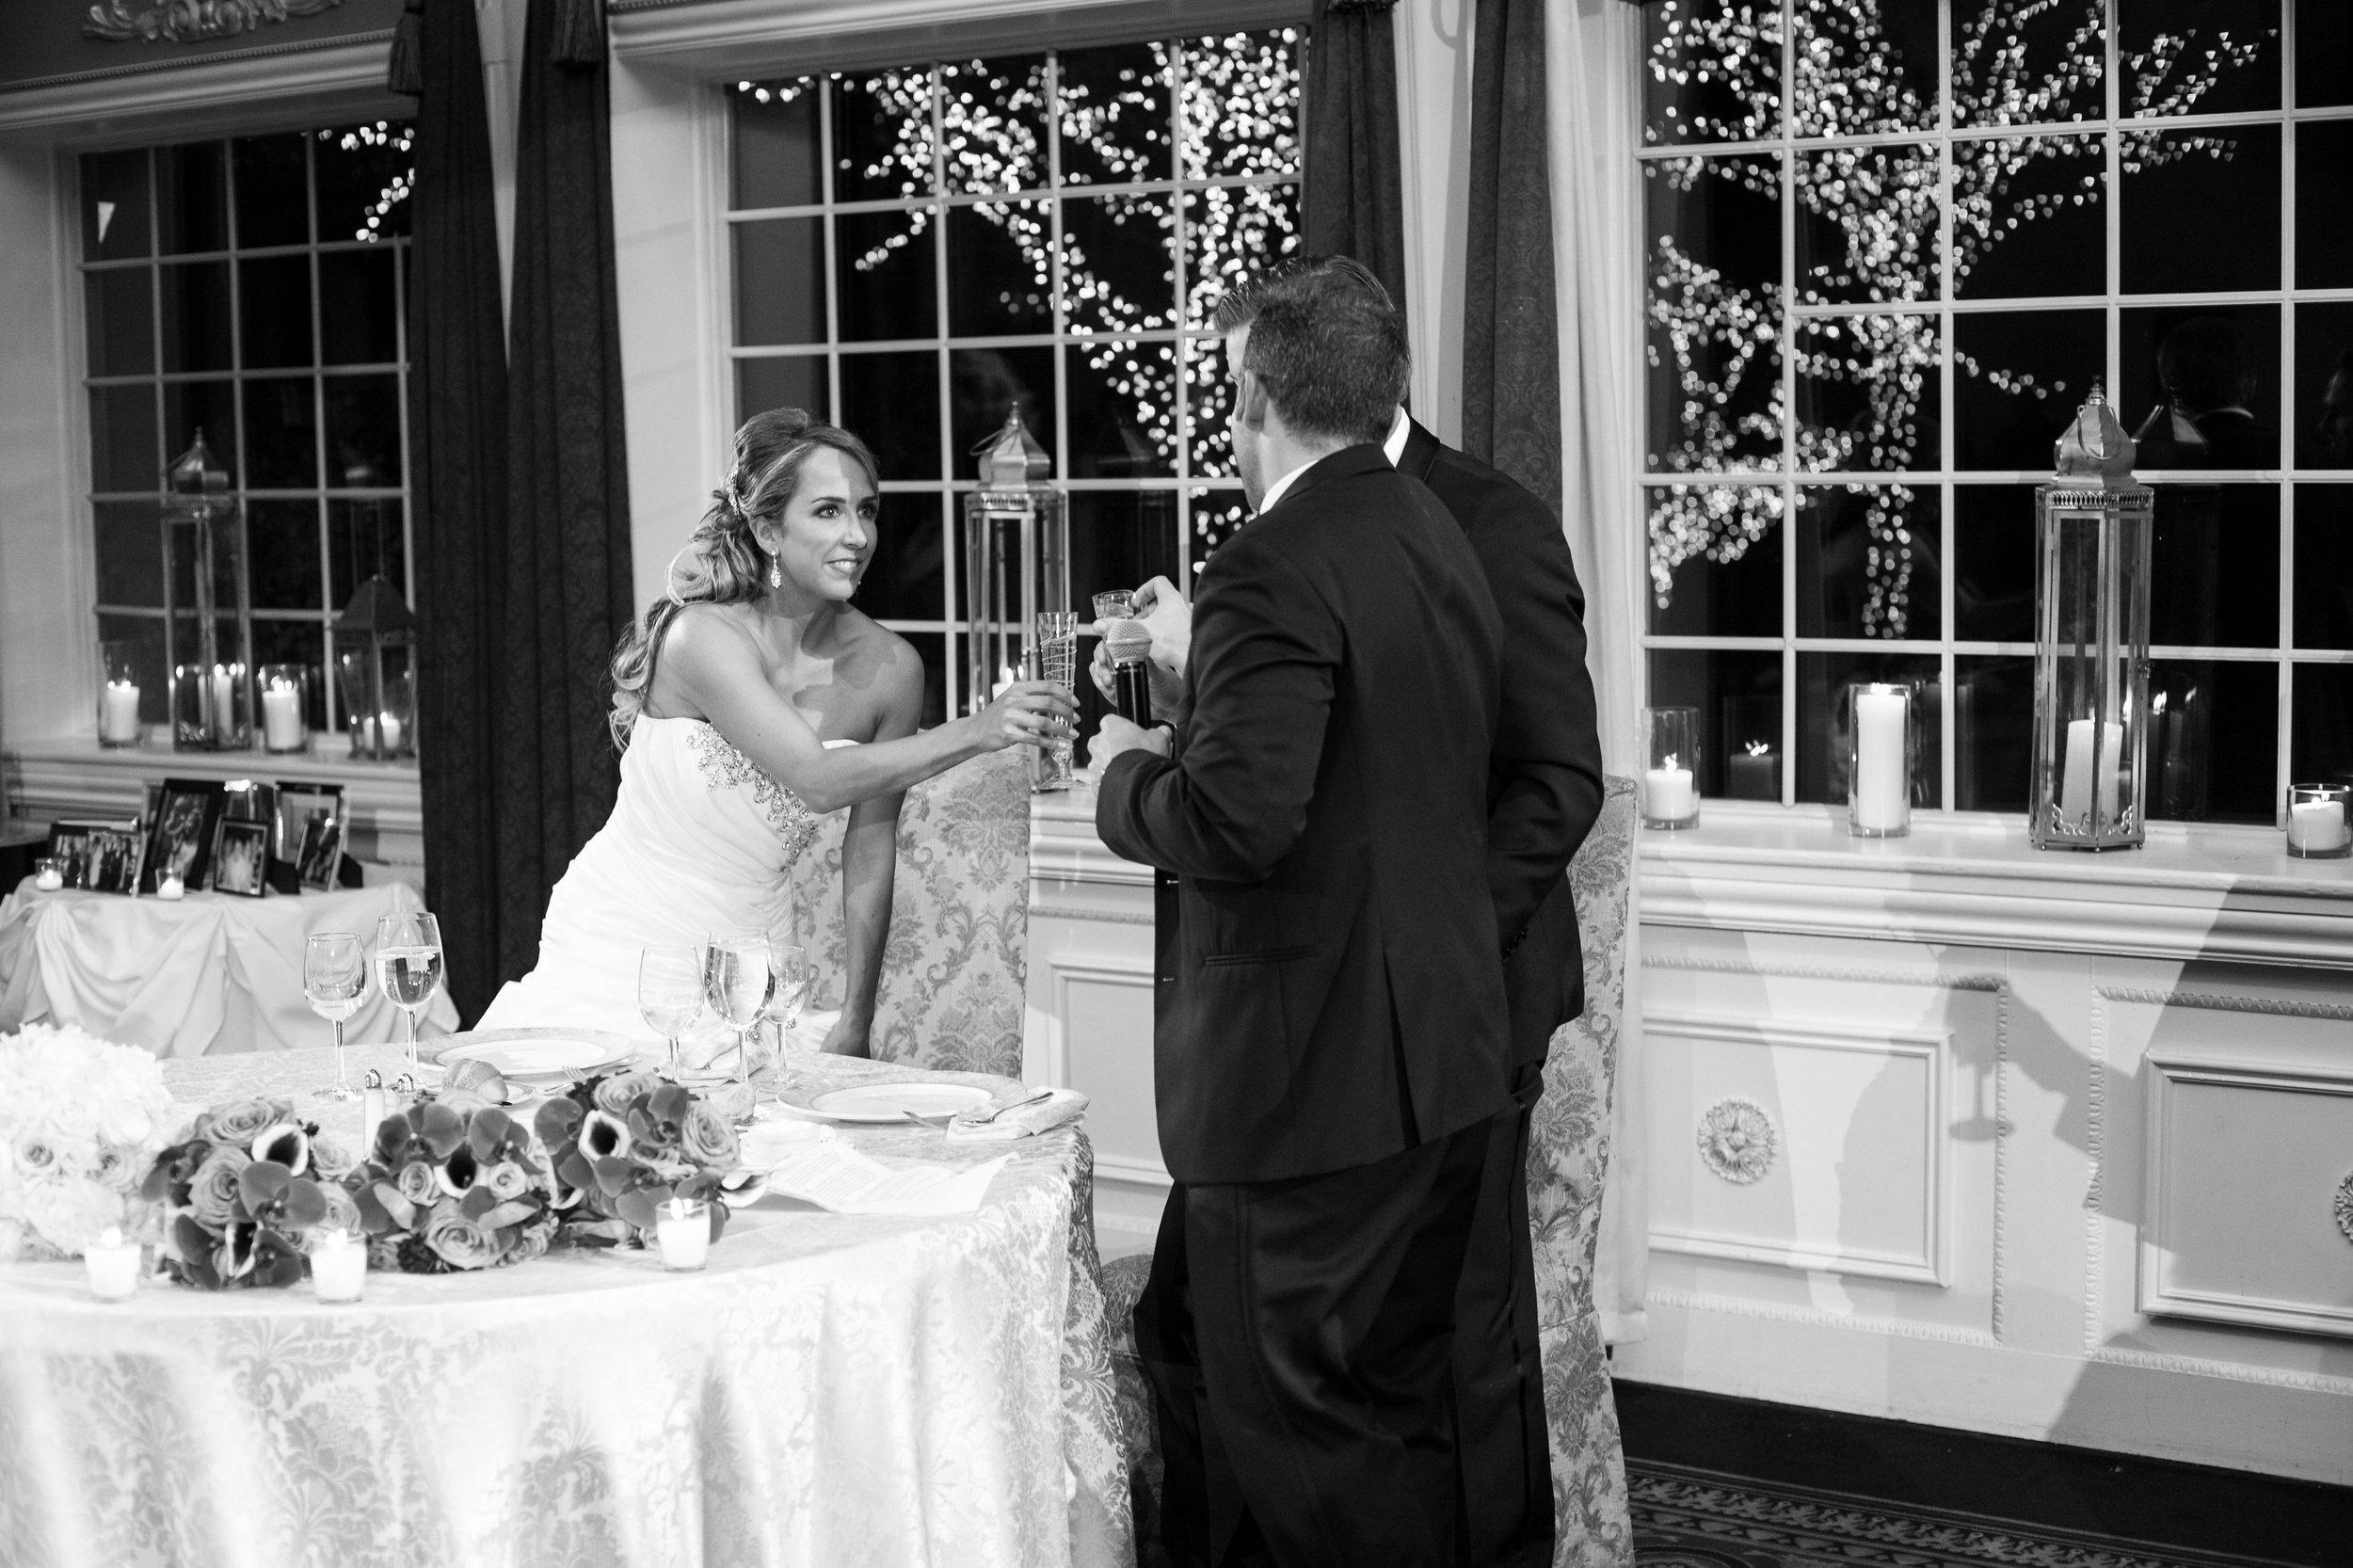 Ceci_New_York_Custom_Invitation_ New_Jersey_Wedding_Luxury_Personalized_Ceci_Style_Bride_Foil_Stamping166.JPG